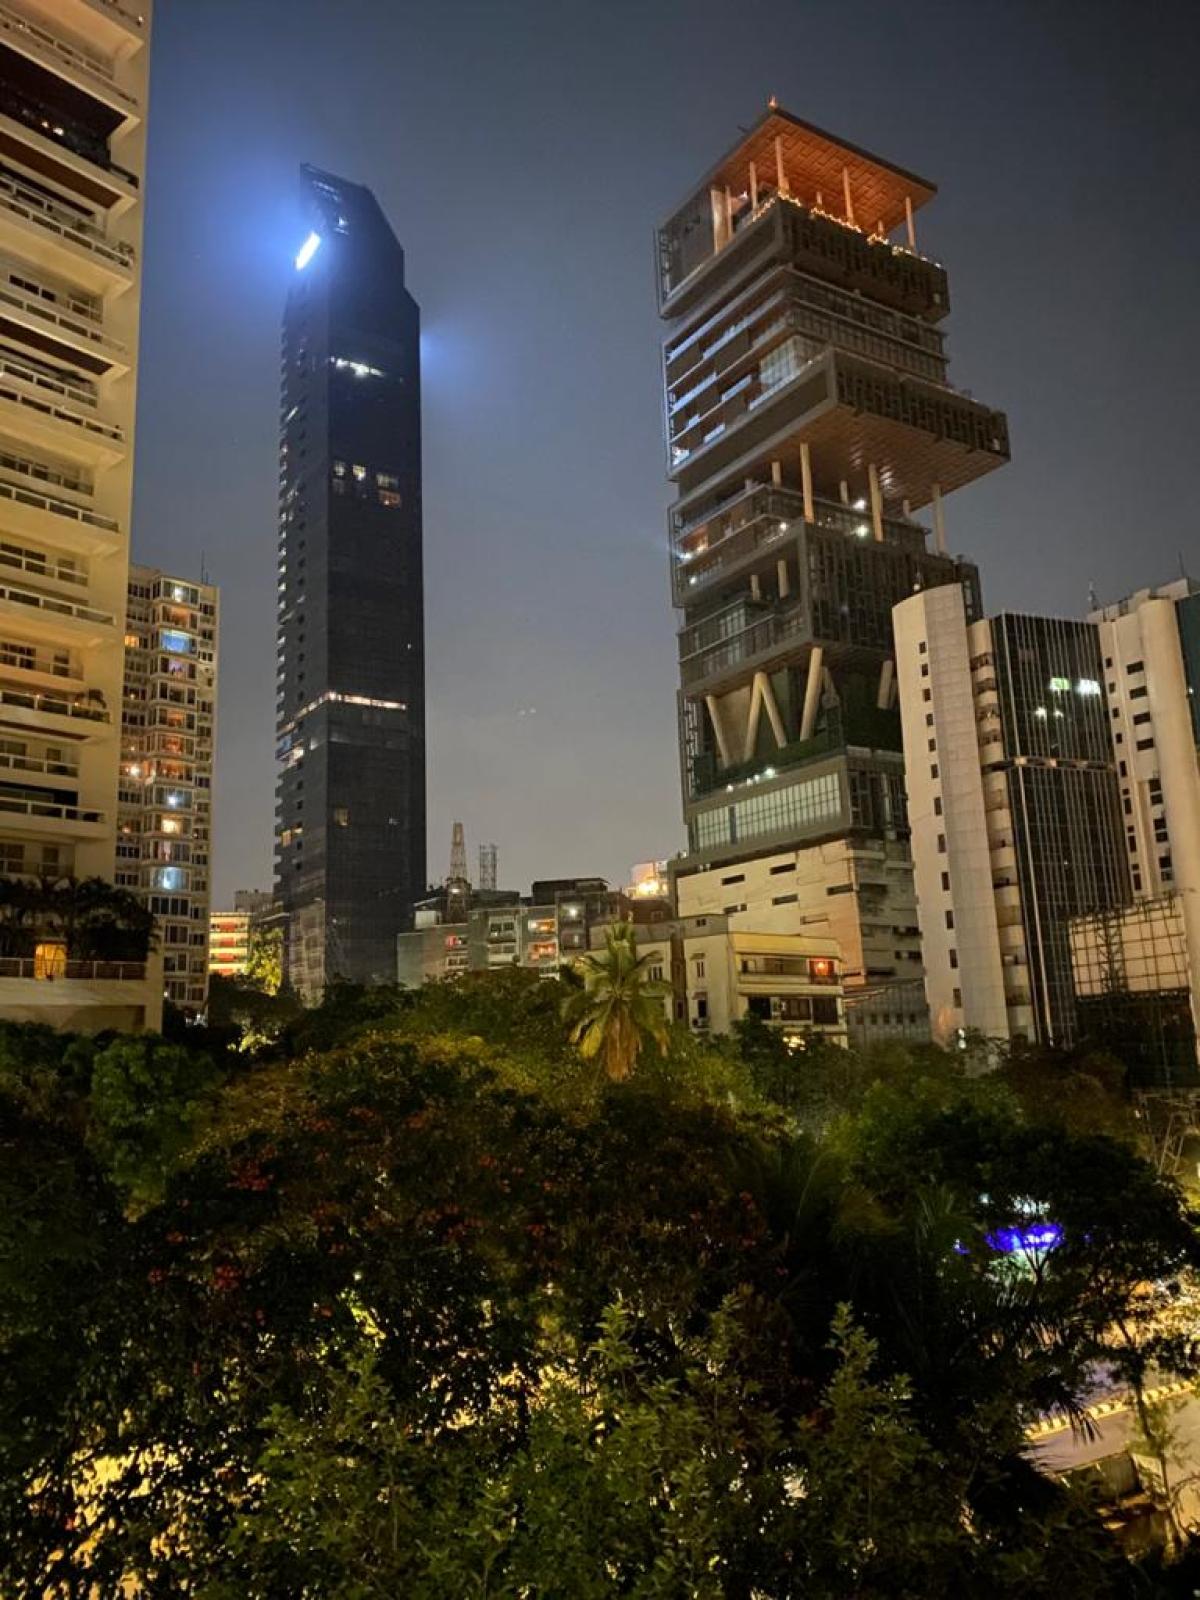 A view from Ammbani's hiuse in Mumbai.